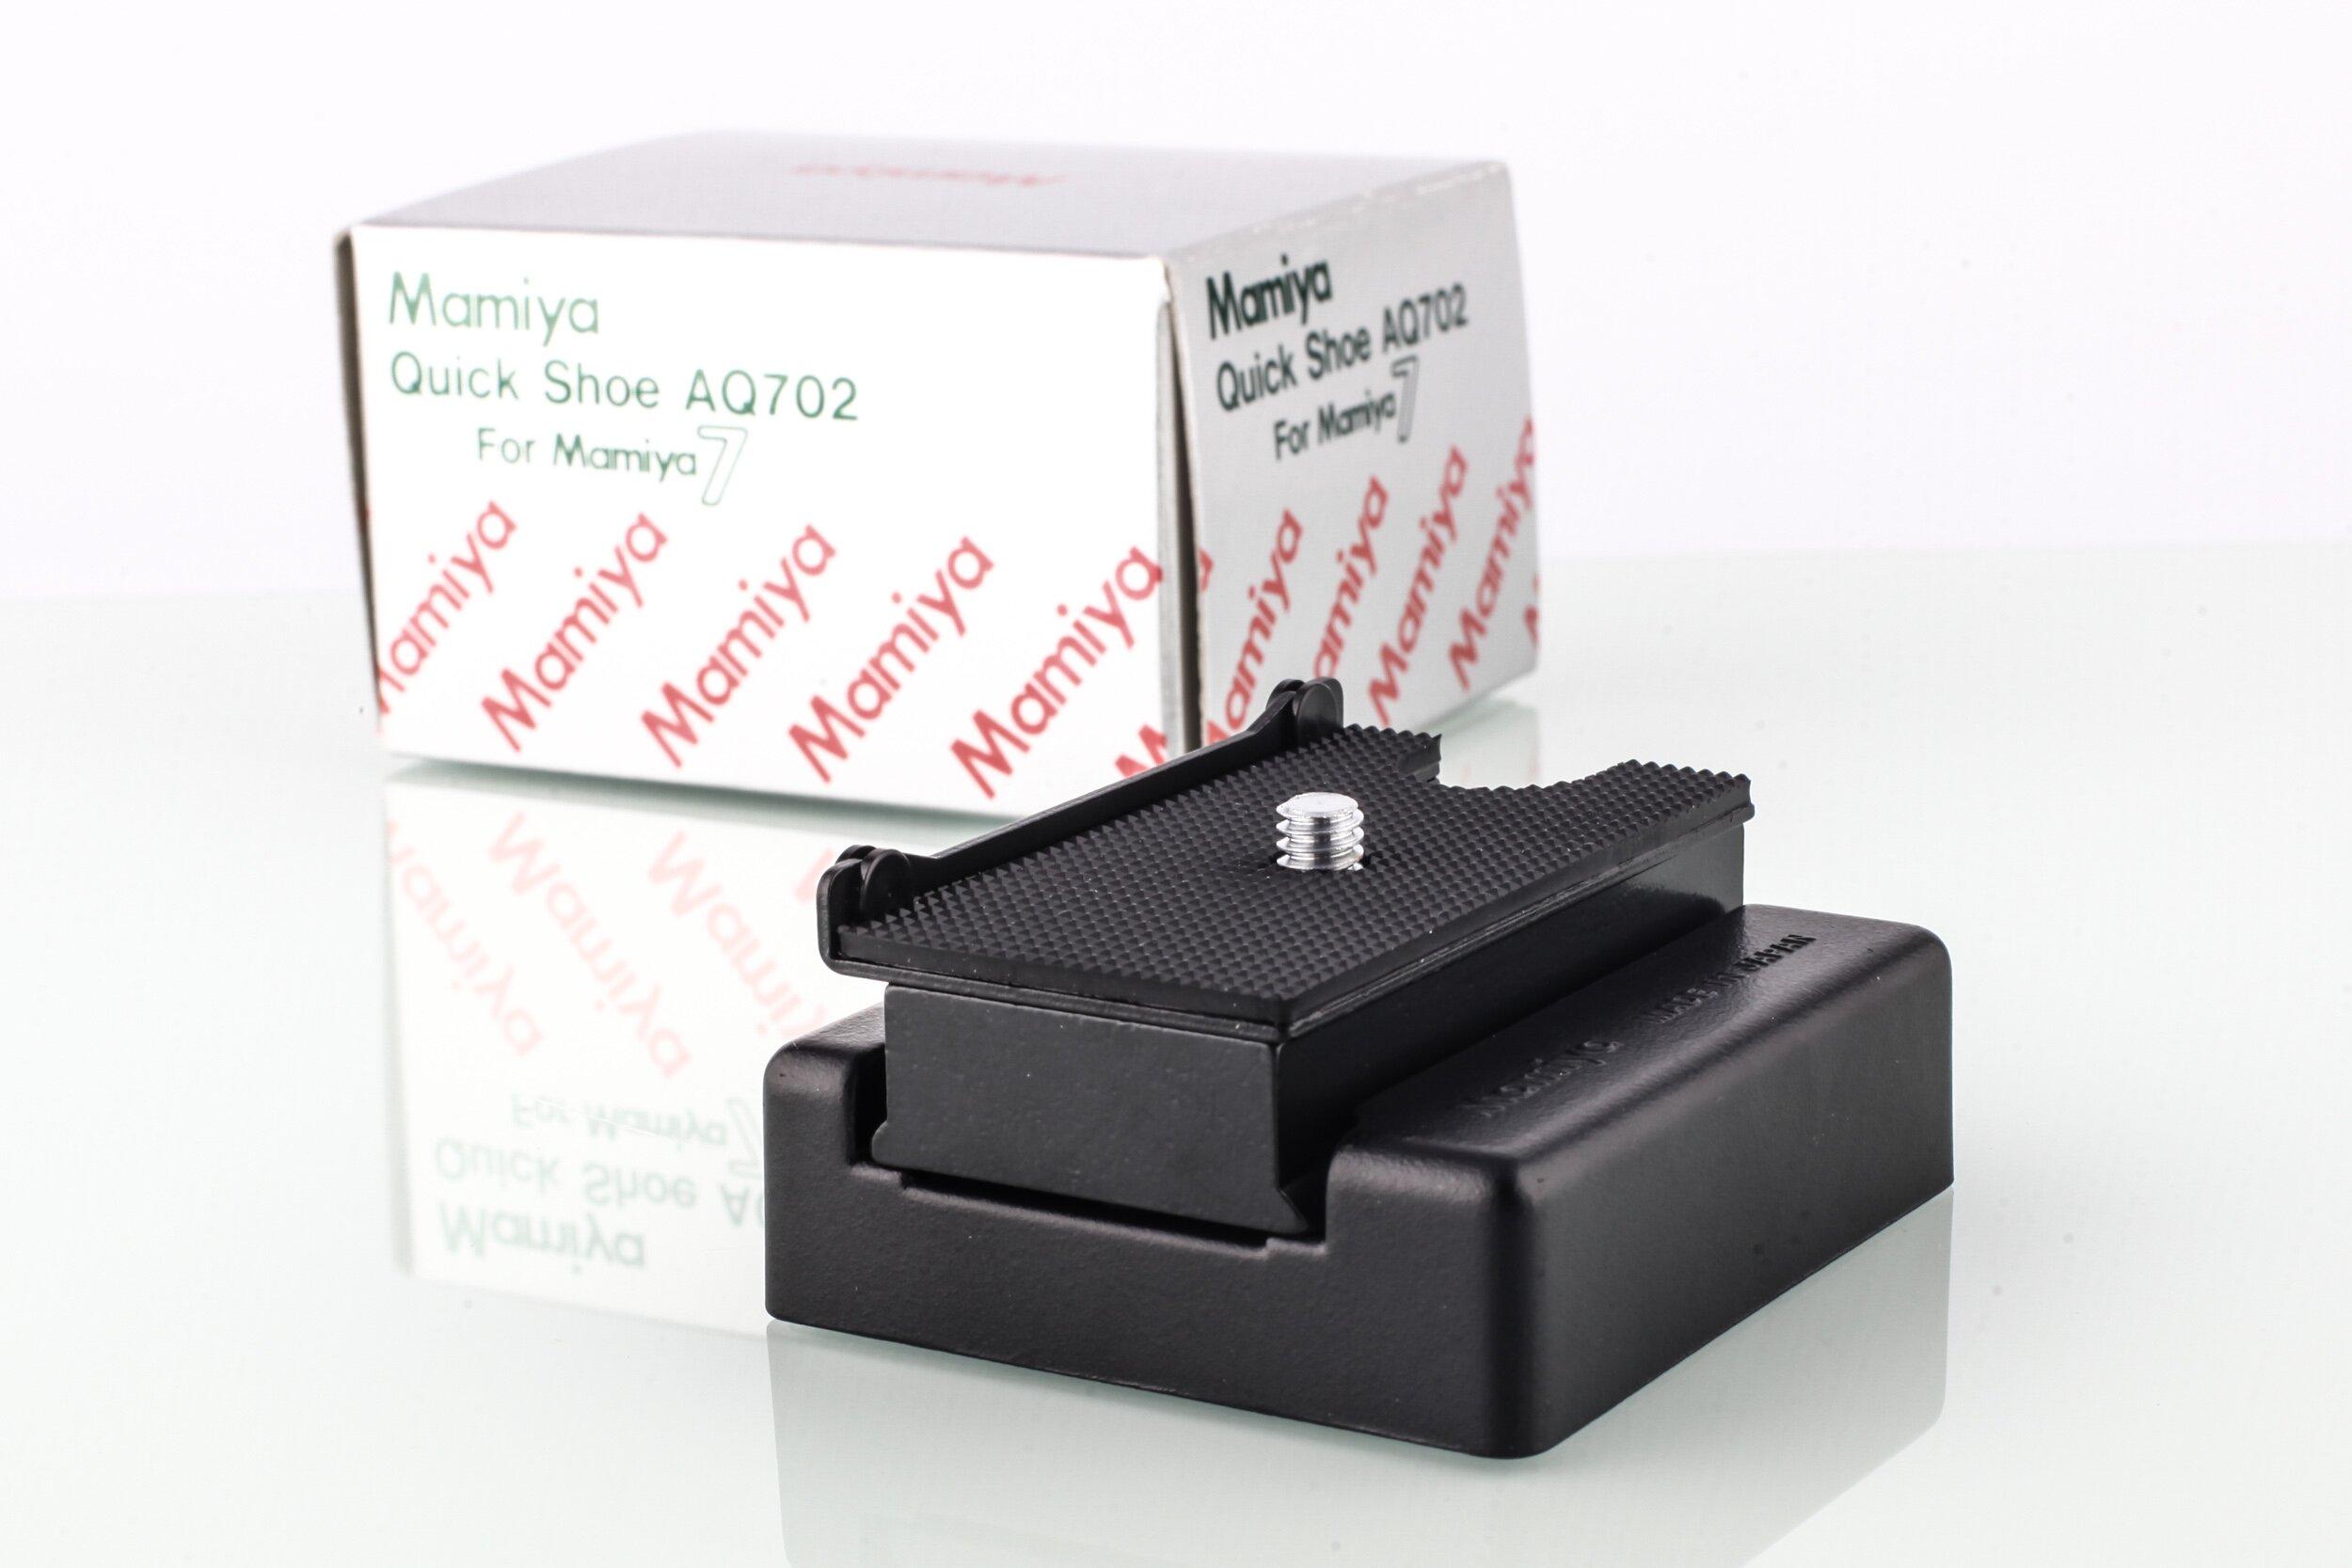 Mamiya 7 Quick Shoe AQ702 OVP